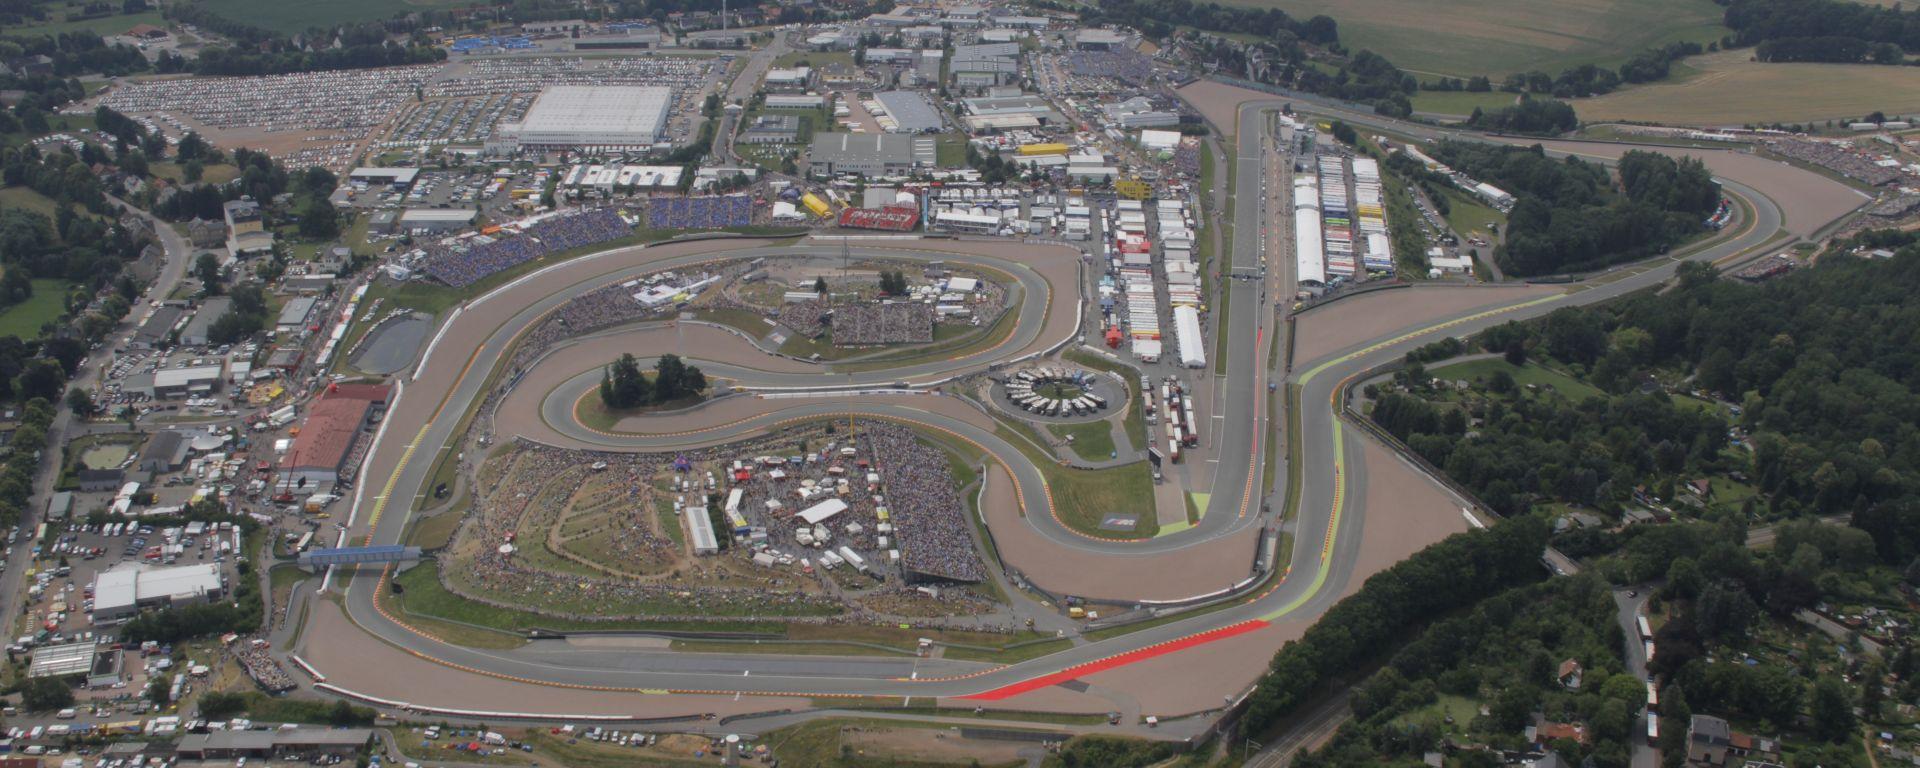 MotoGP 2016 Germania: orari e diretta TV del GP al Sachsenring